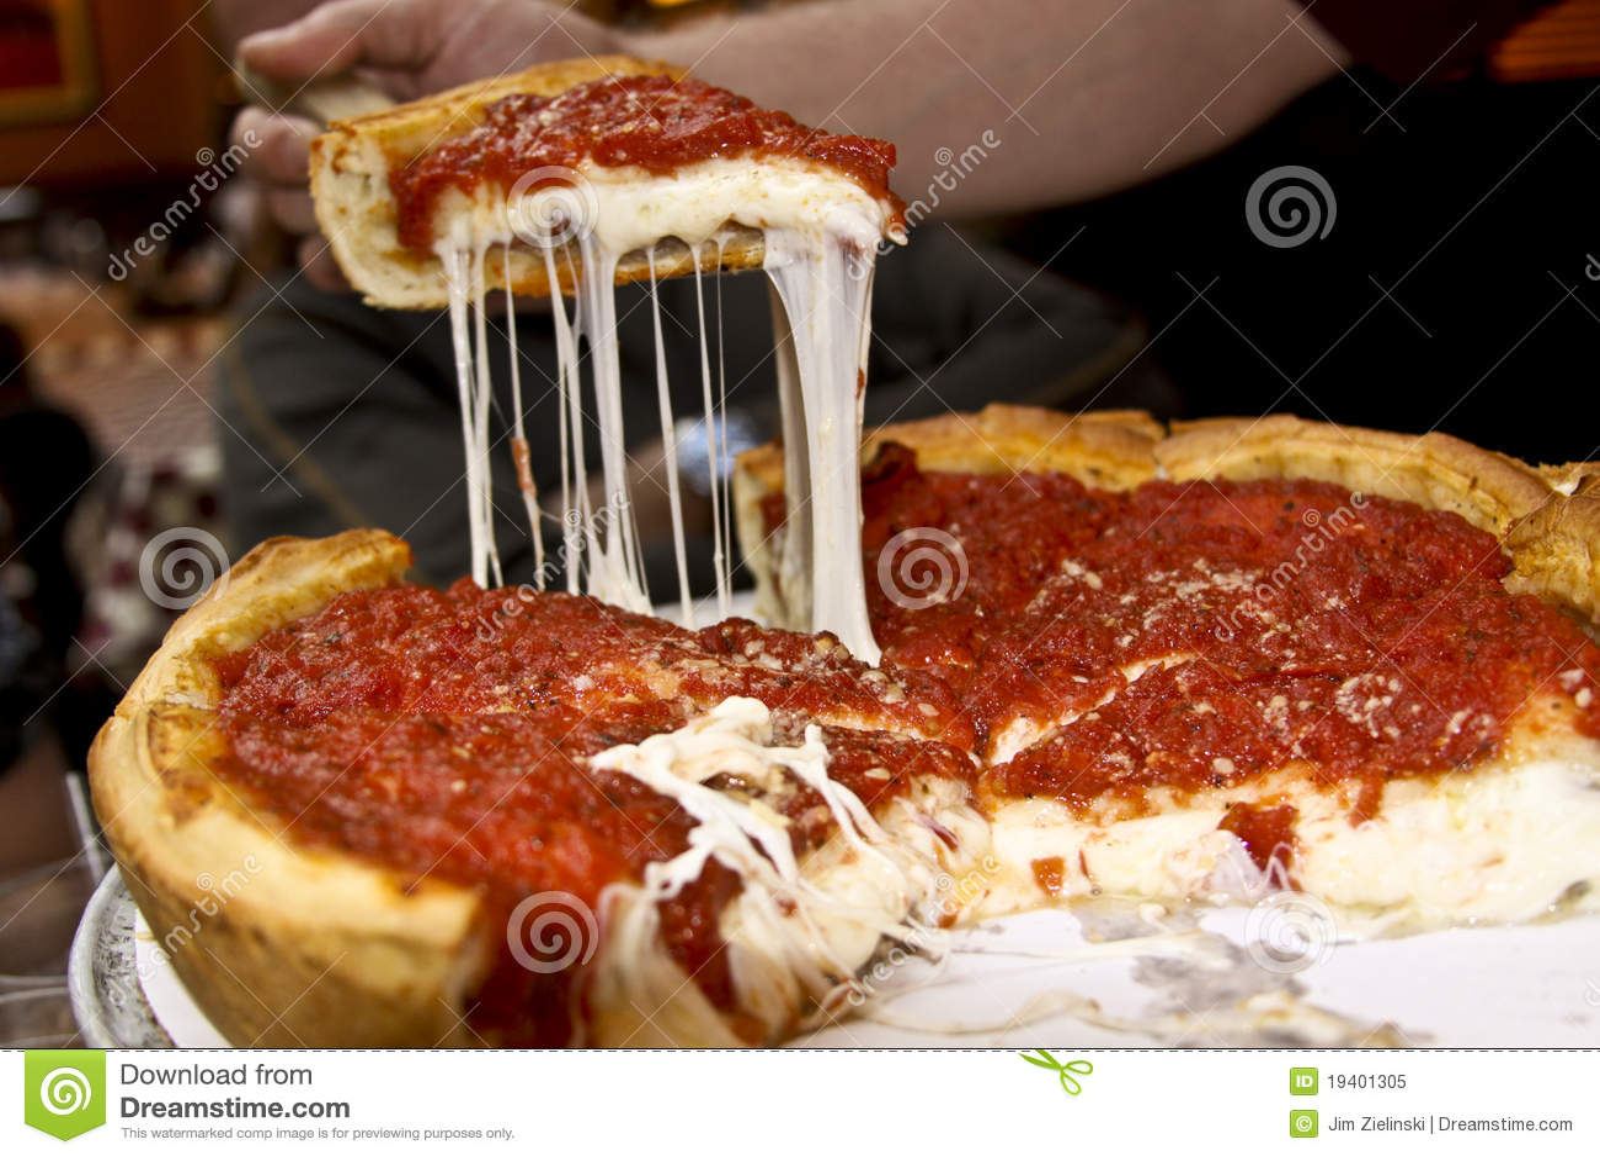 Delicious Chicago Deep Dish Pizza